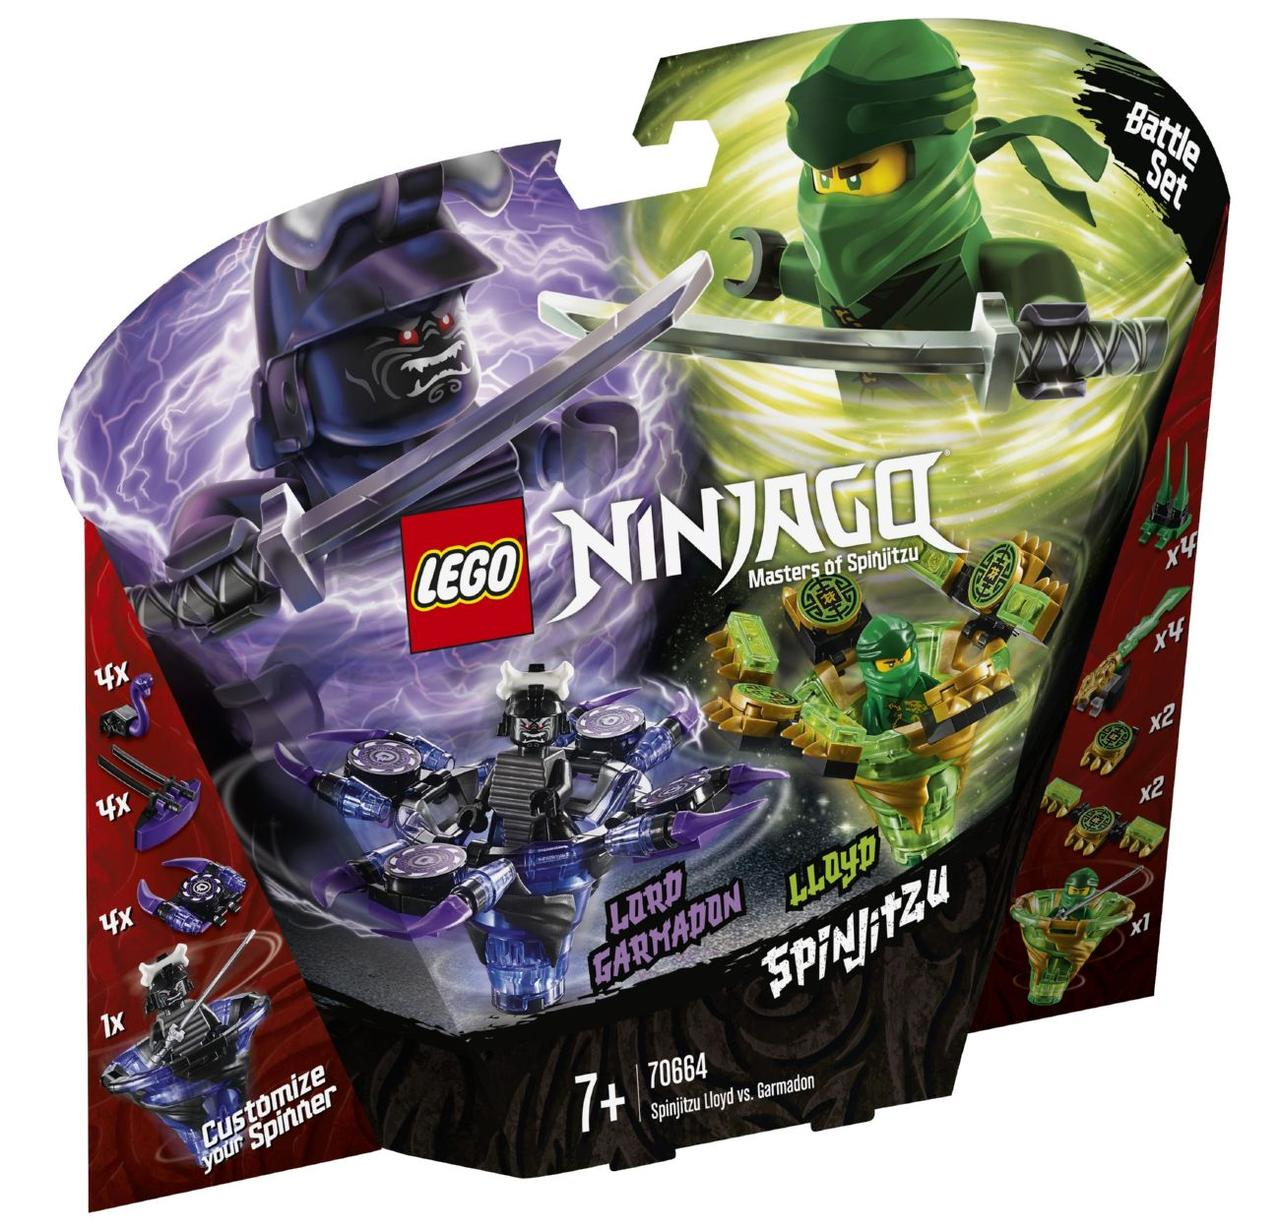 Lego Ninjago Ллойд майстер Кружітцу проти Гармадона 70664